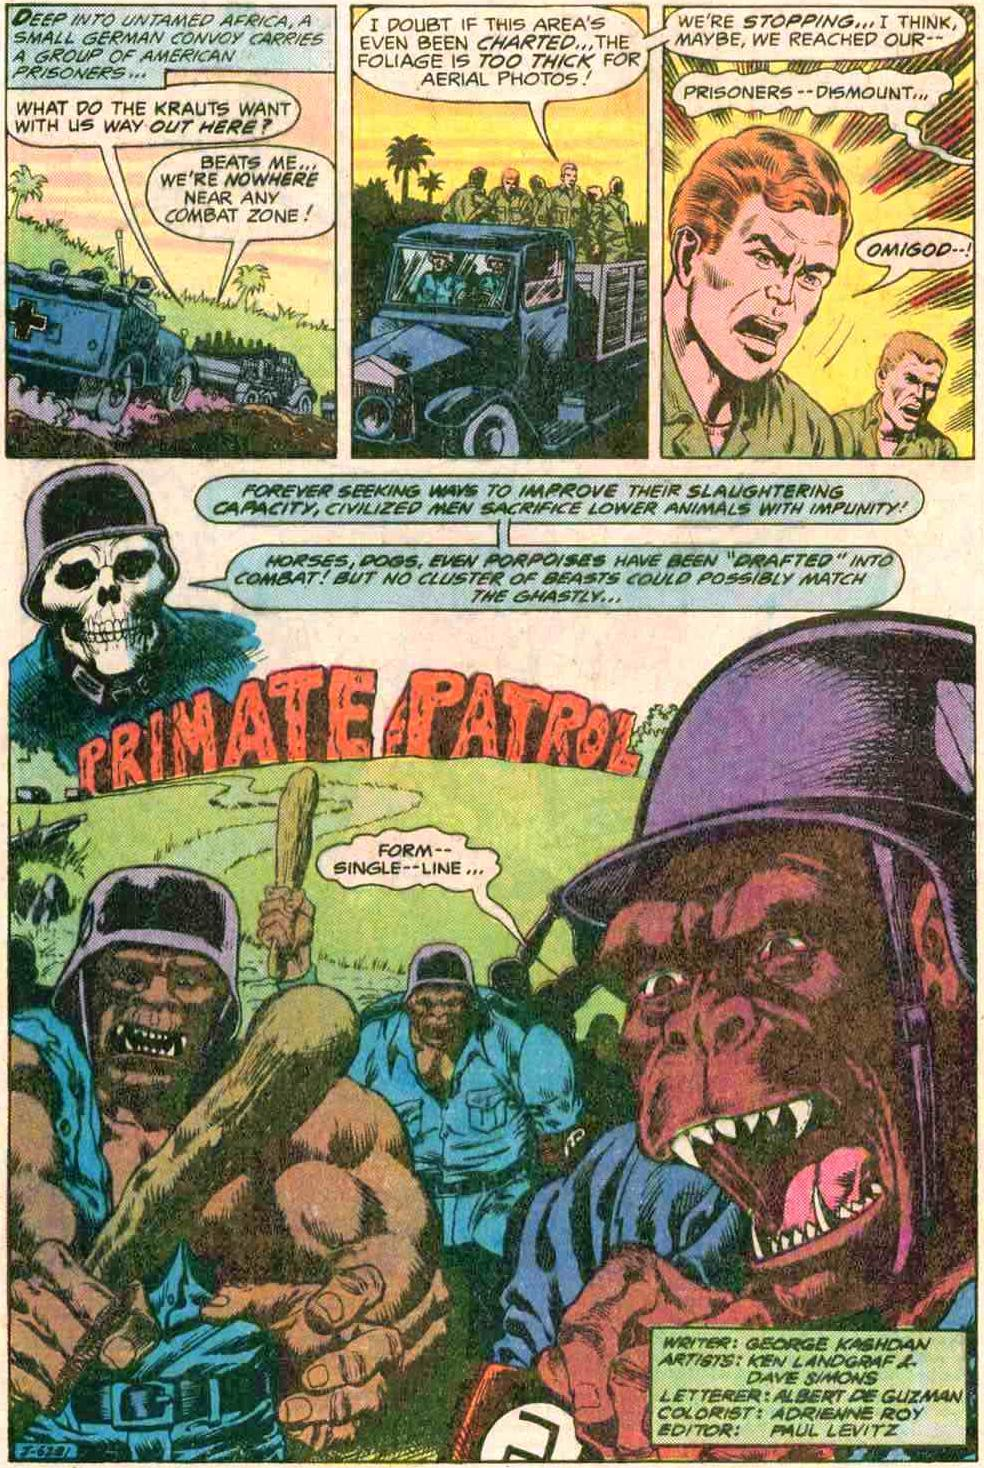 primate patrol1